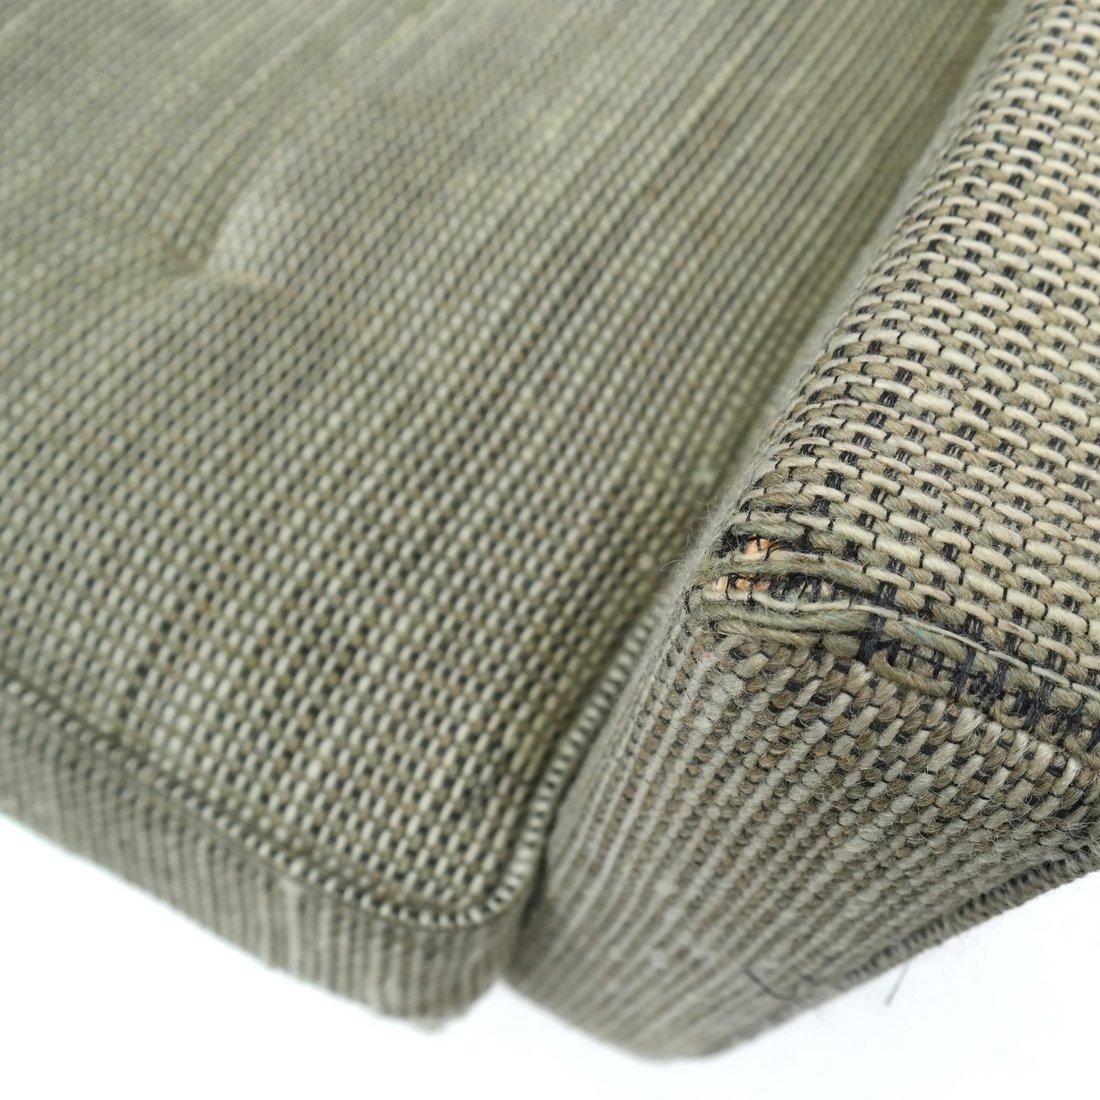 Knoll Green Upholstered Sofa - 6